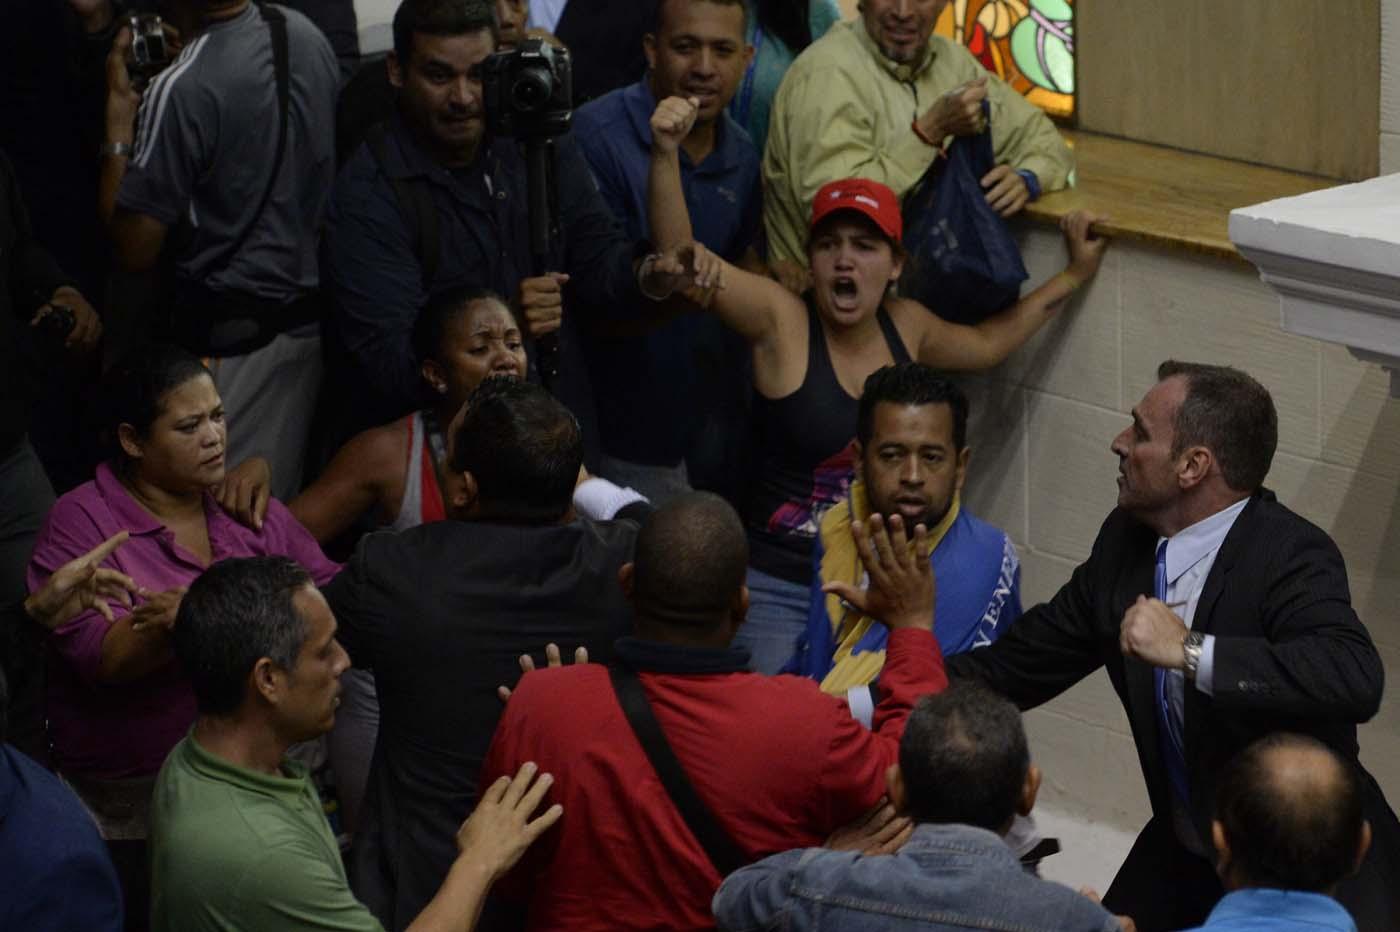 Gobierno de Nicolas Maduro. - Página 18 000_HF3DS-2